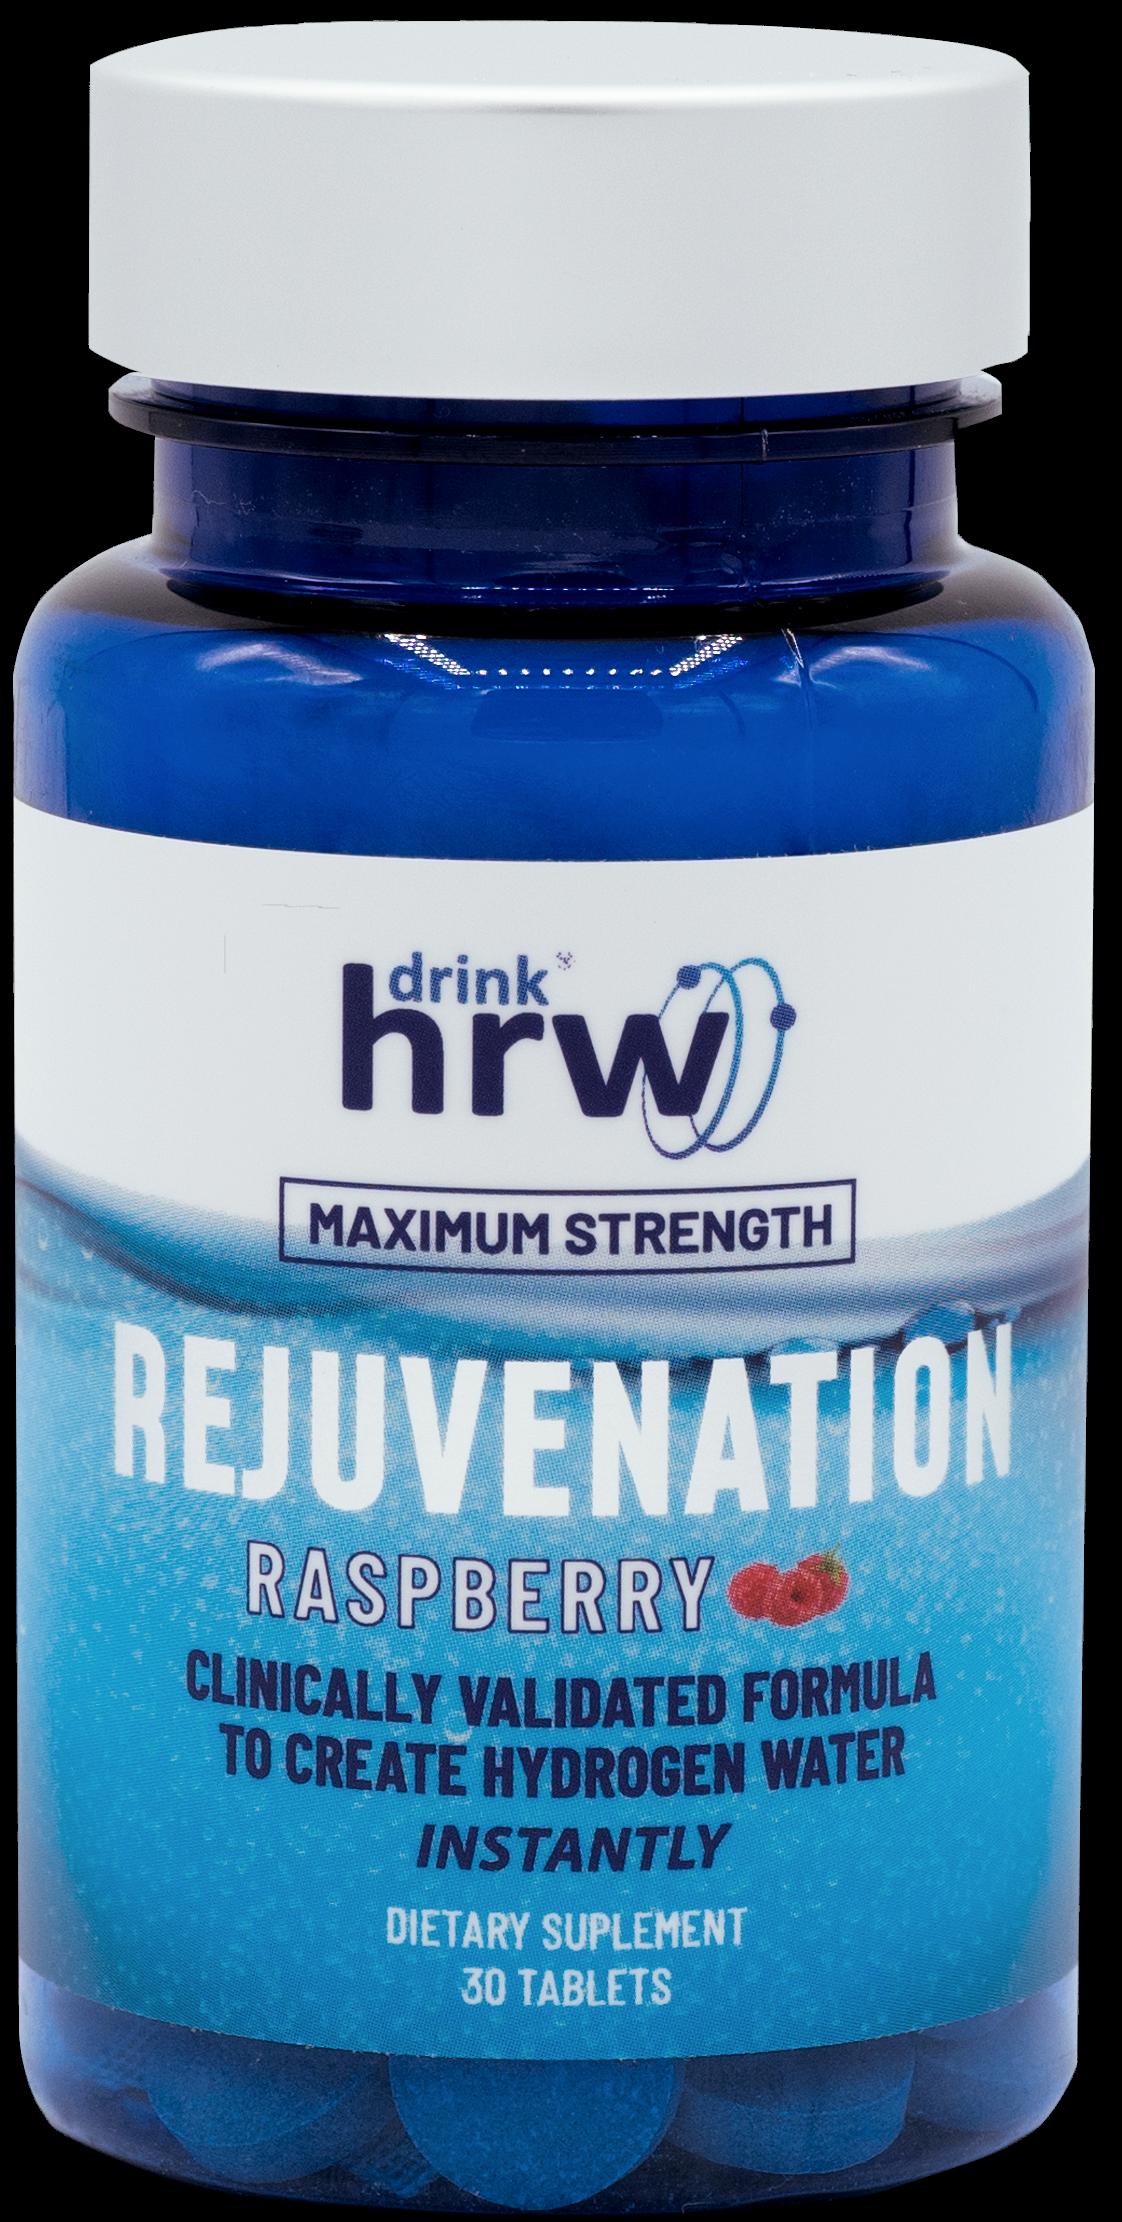 Rejuvenation Blue Raspberry